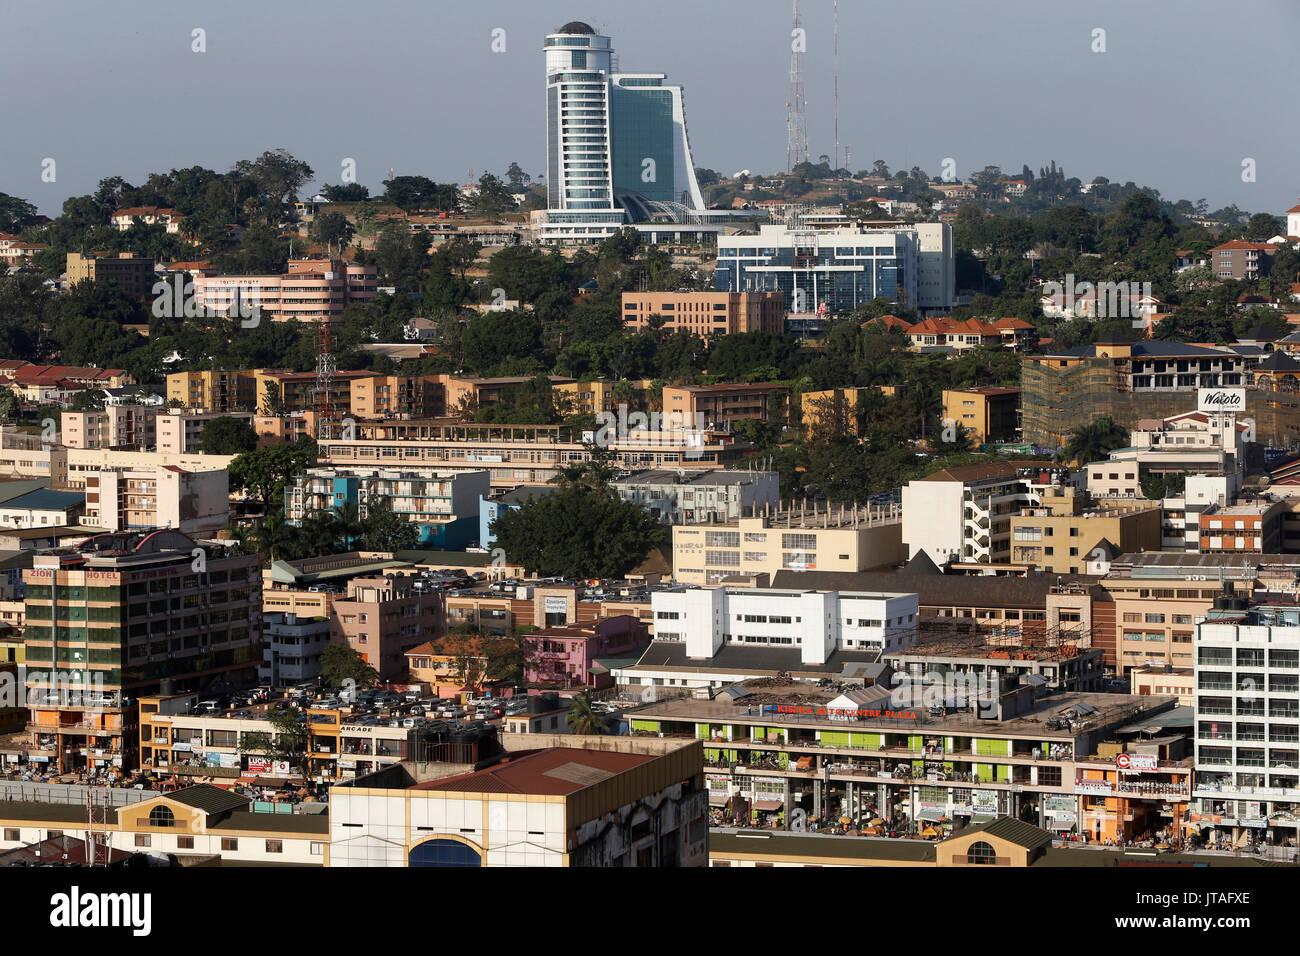 Kampala city, Uganda, Africa - Stock Image